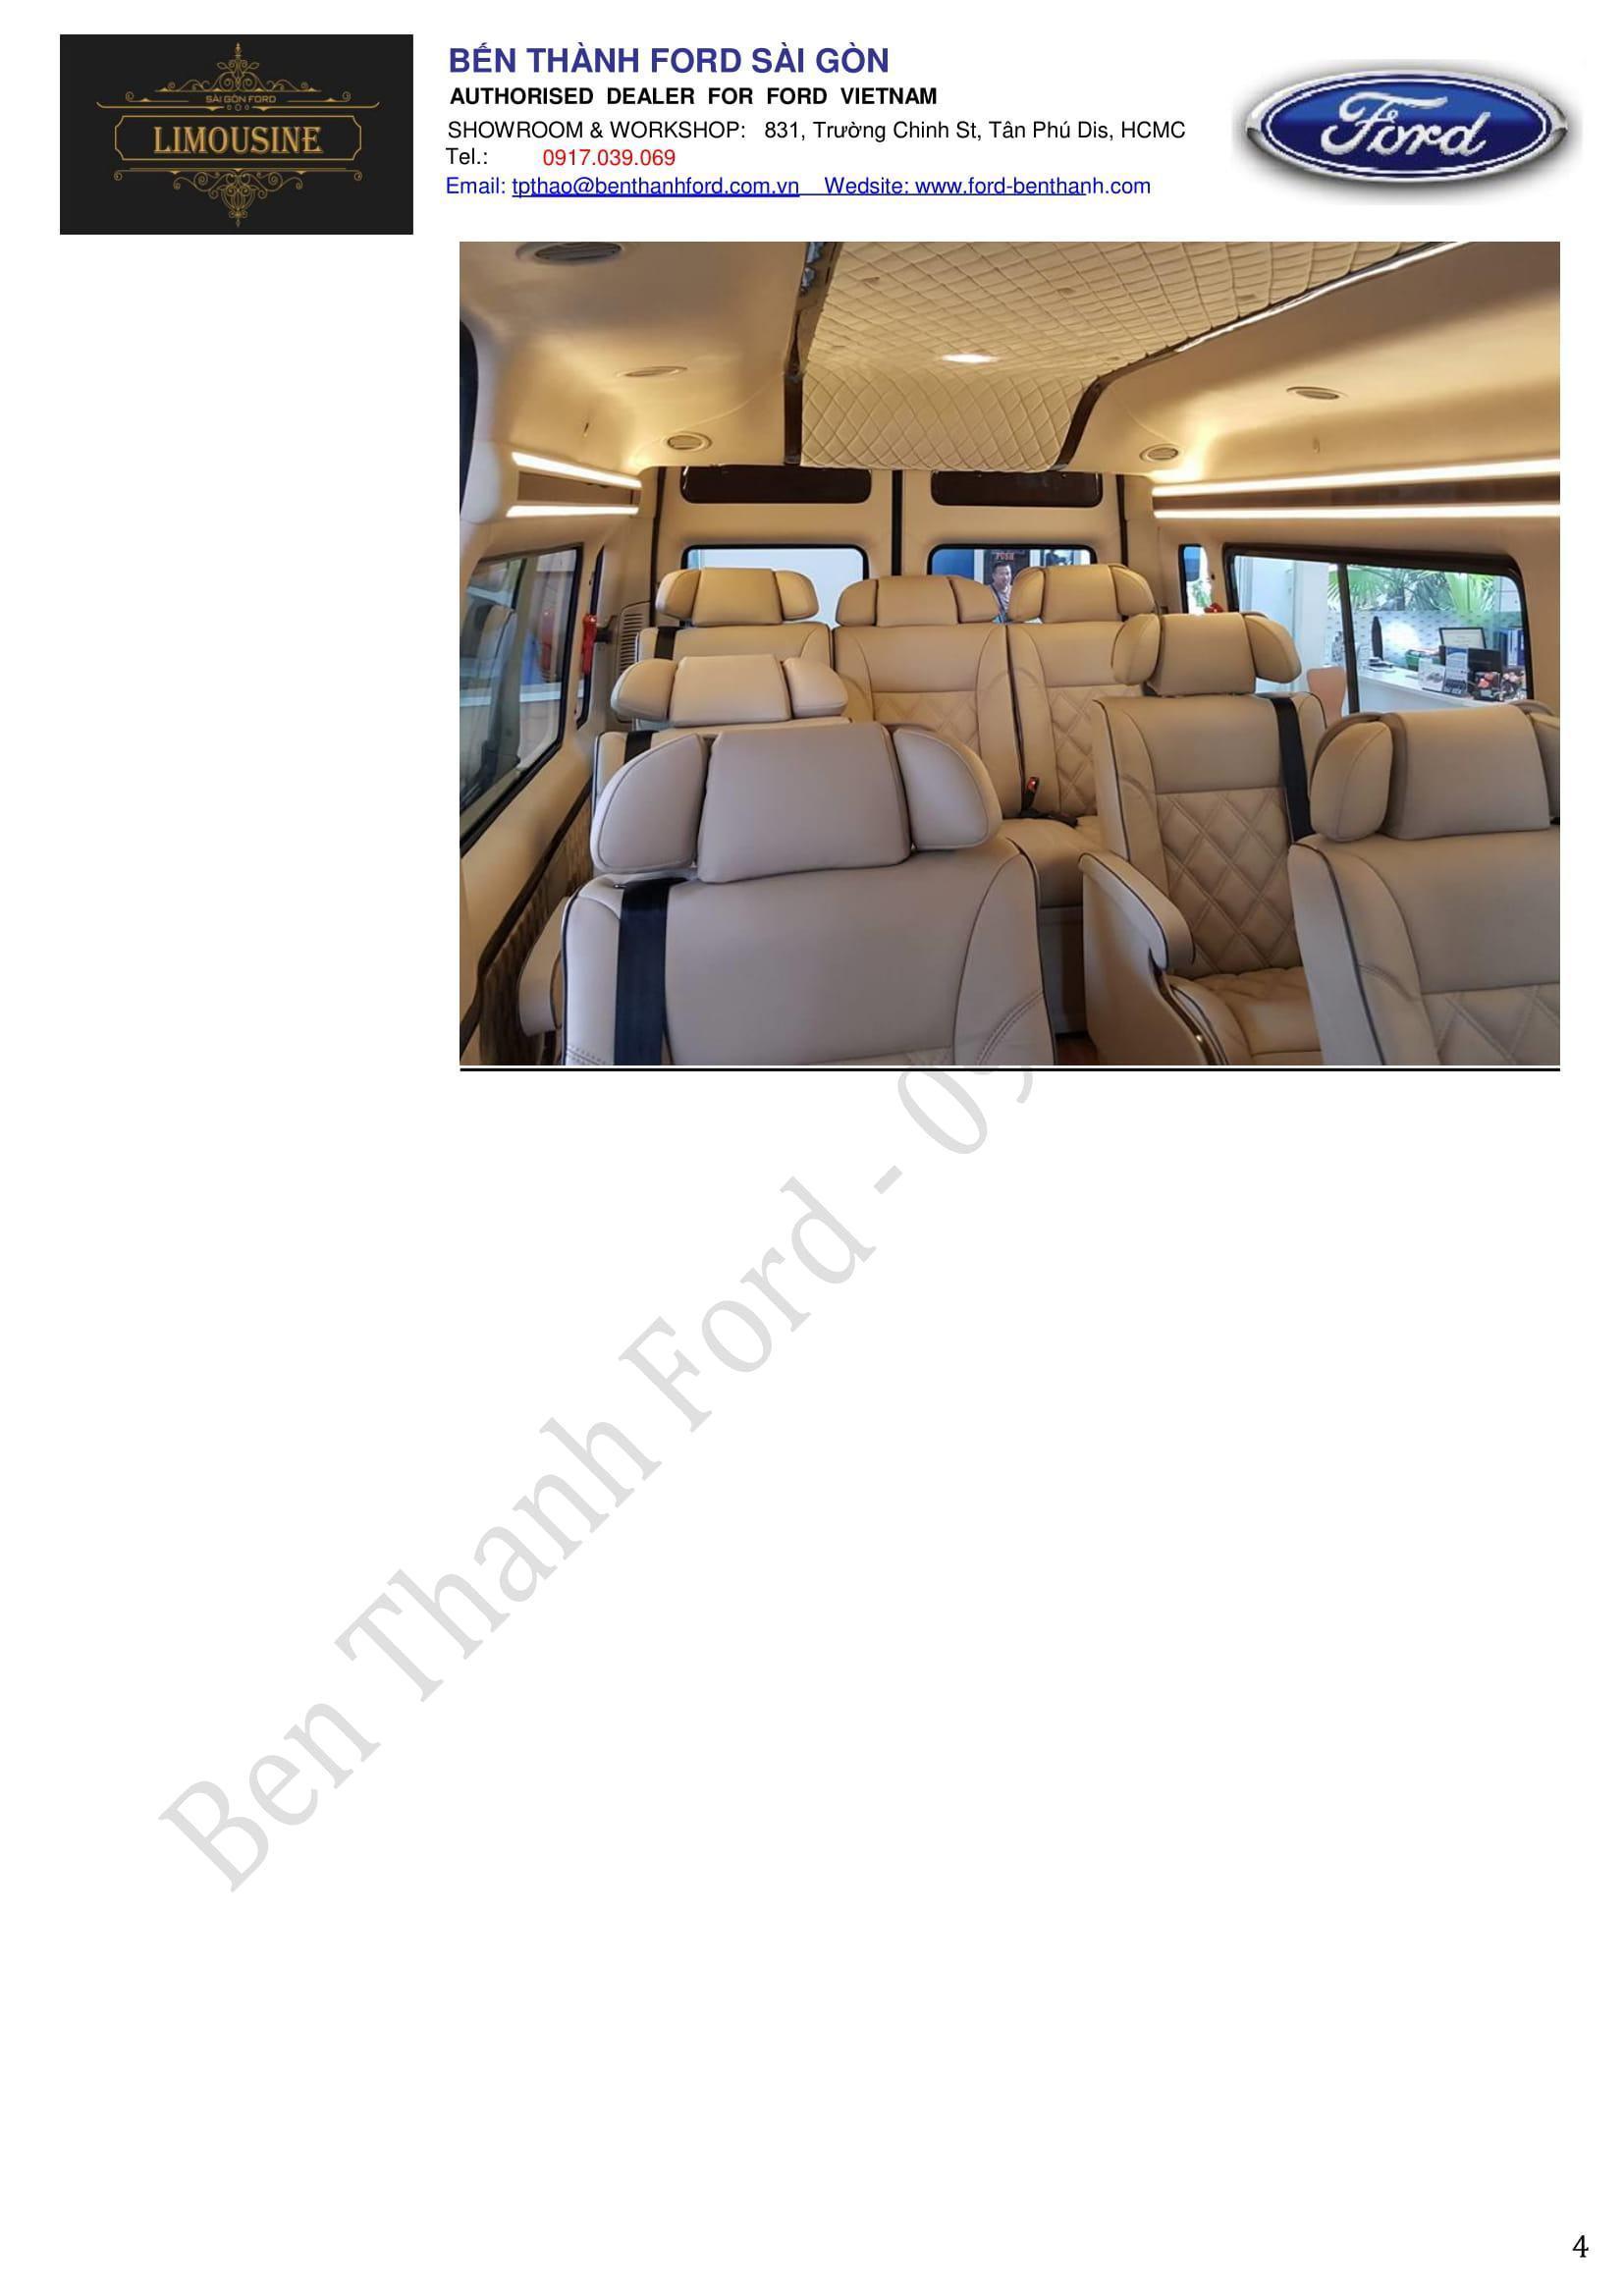 Limousine 1,195 BenThanhFord 0917039069-4